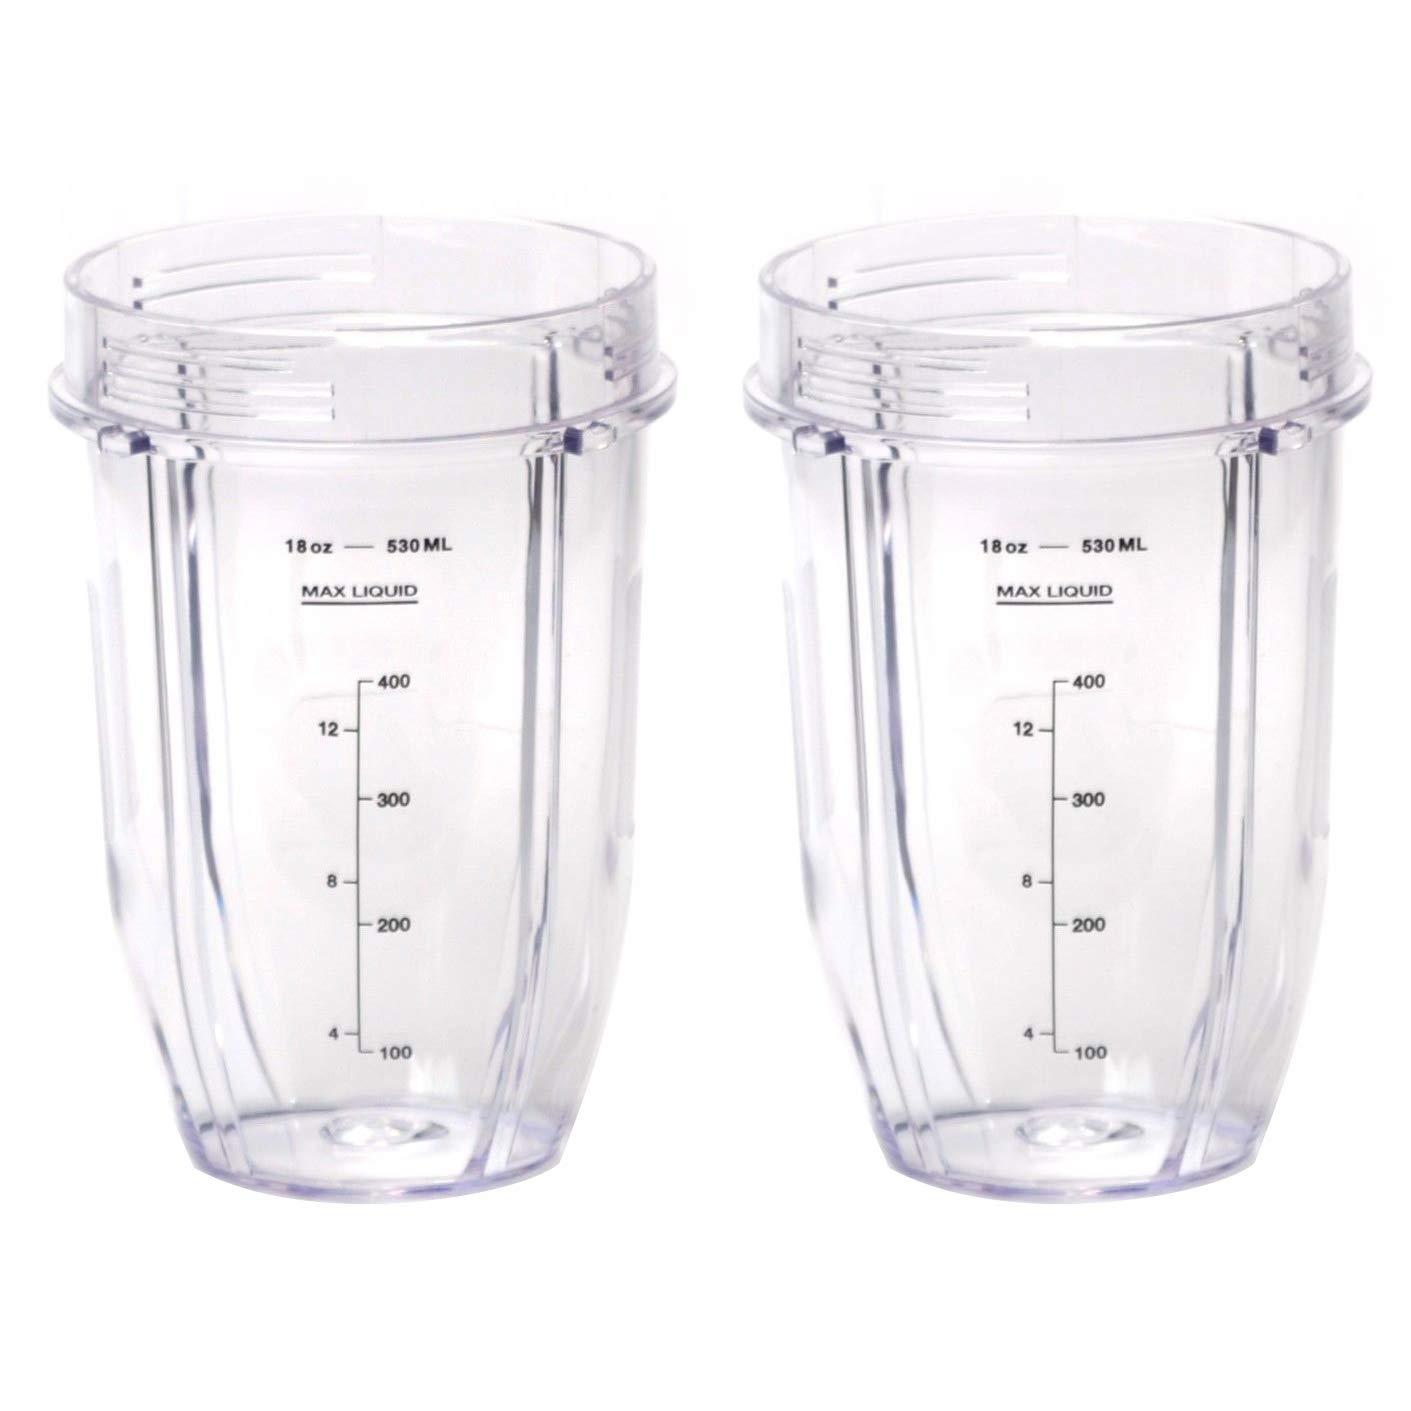 Nutri Ninja 18 oz Tritan Cups | Compatible with BL480, BL490, BL640, BL680 Auto IQ Series Blenders (Pack of 2)